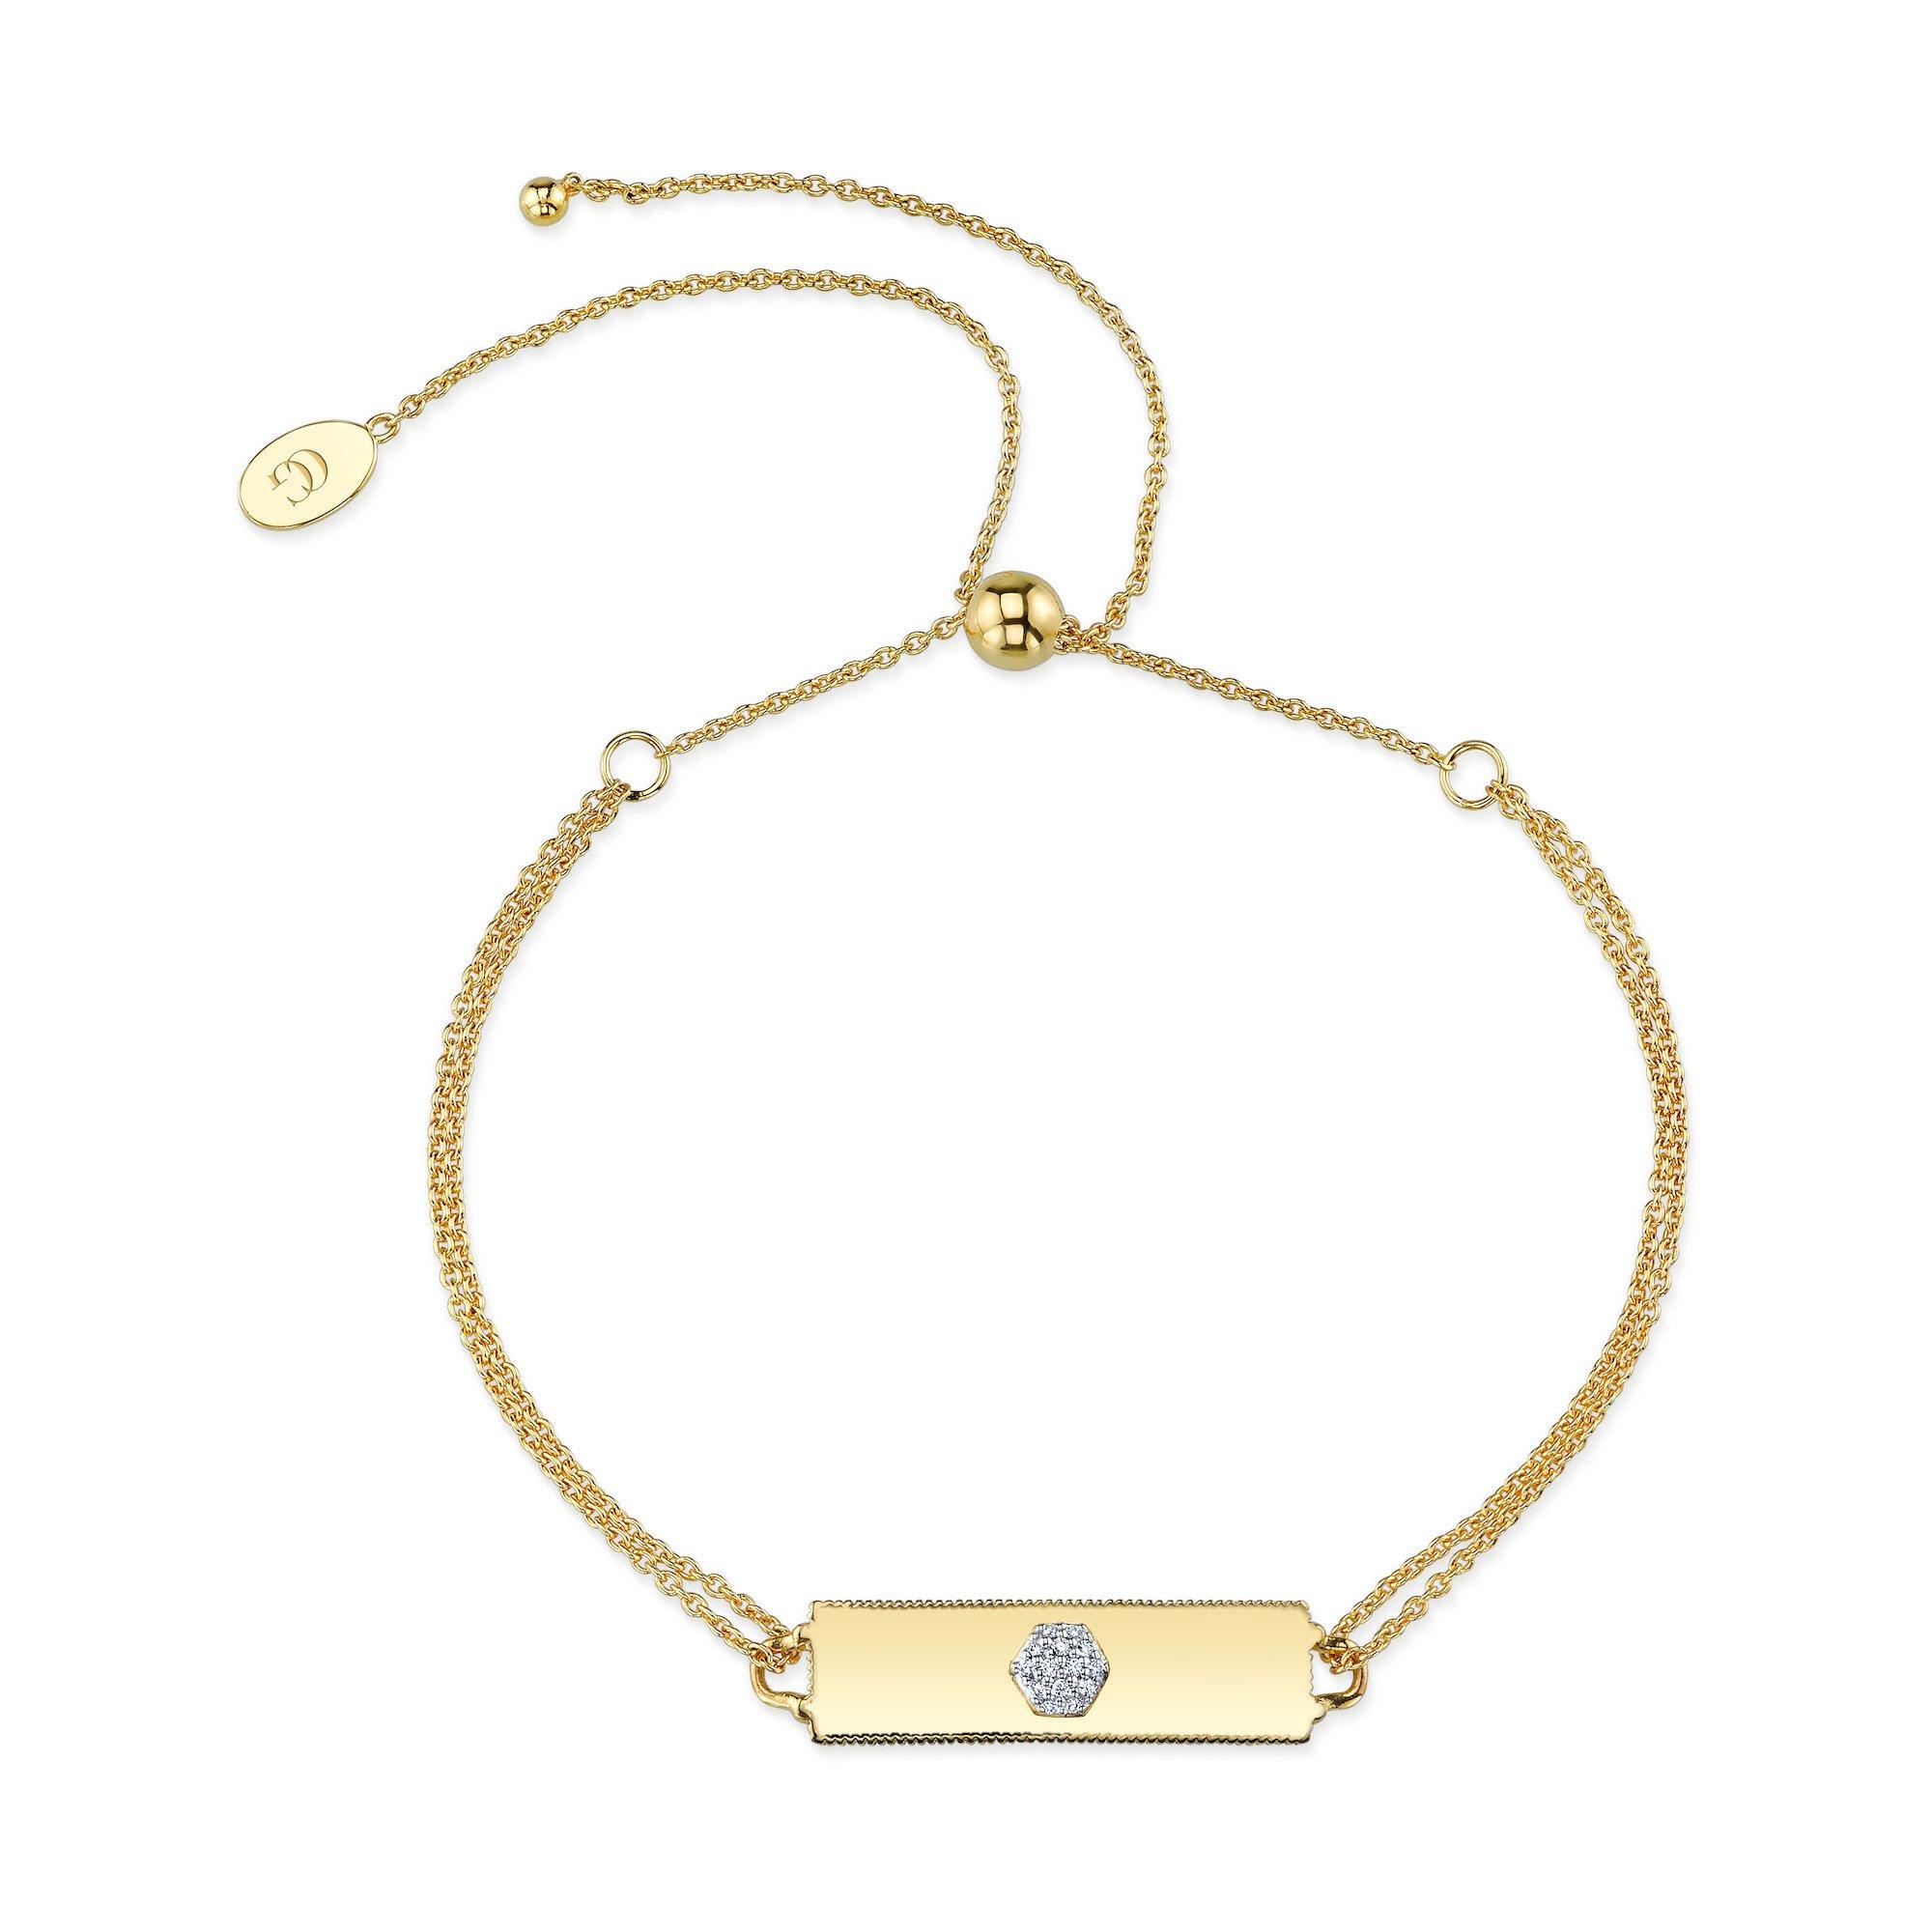 CHARLIZE GADBOIS Sterling Silver Diamond Bracelet (0.054 cttw, I1-I2 Clarity) Gold Plated